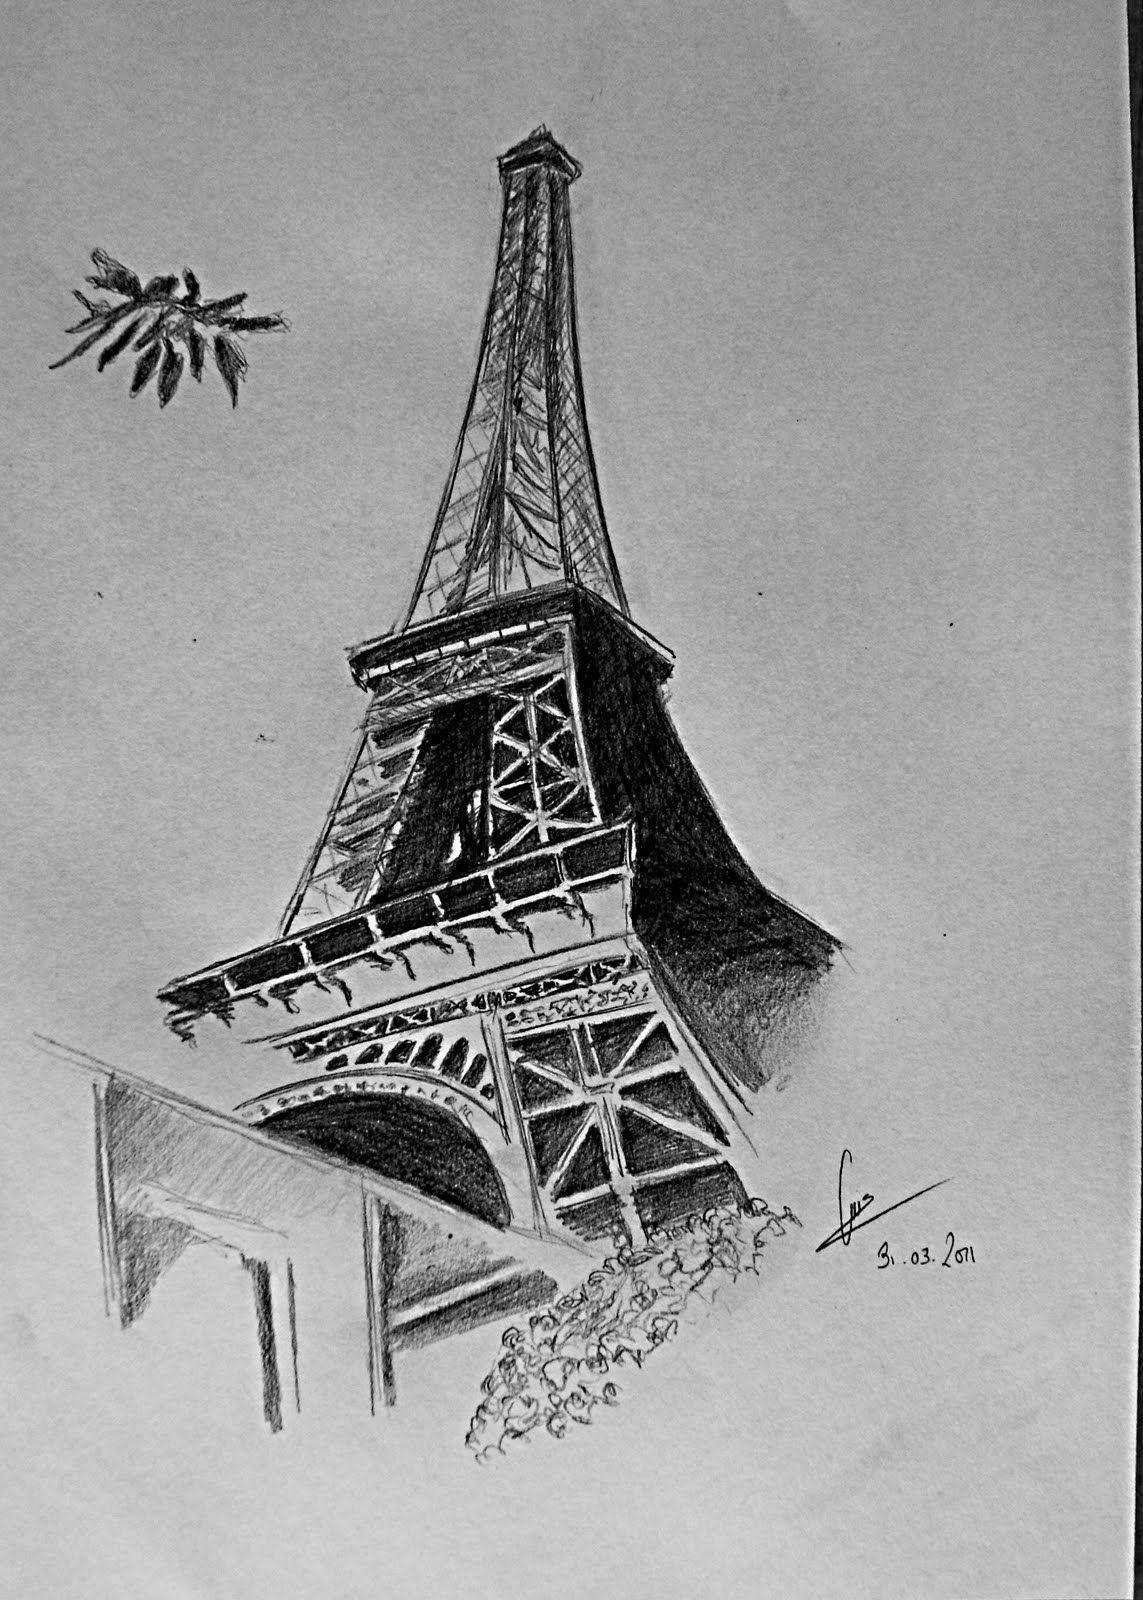 Dibujo de la torre | La torre eiffel | Pinterest | Dibujos del ...